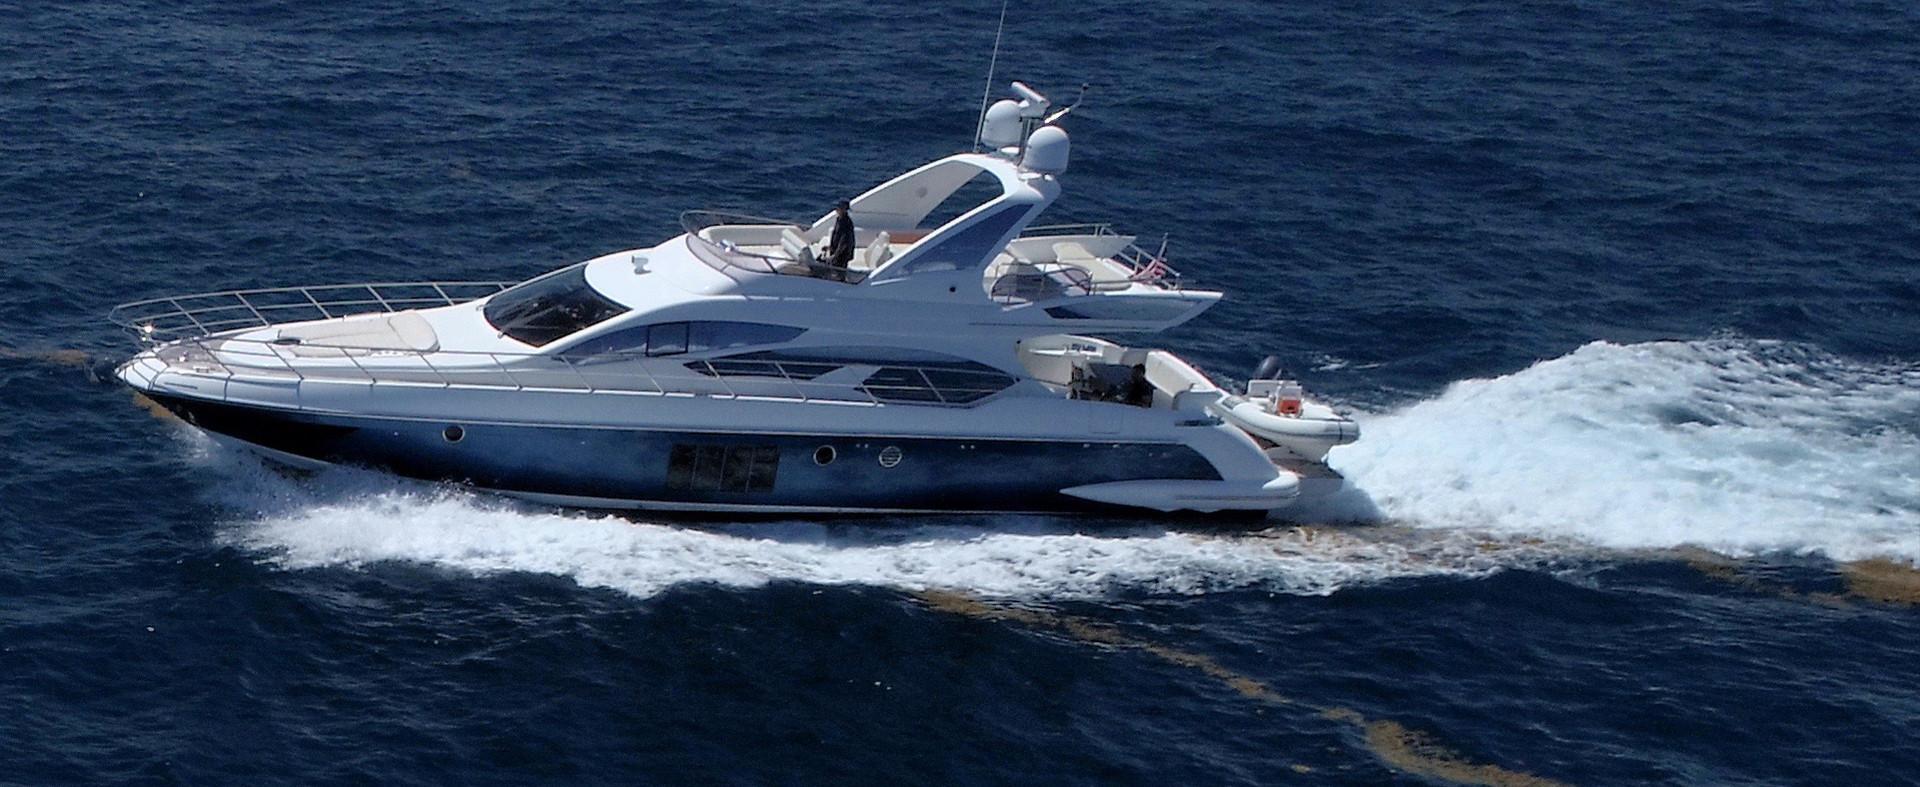 Yacht - Ryan Craft - 5-3-2017 (9 of 50)E